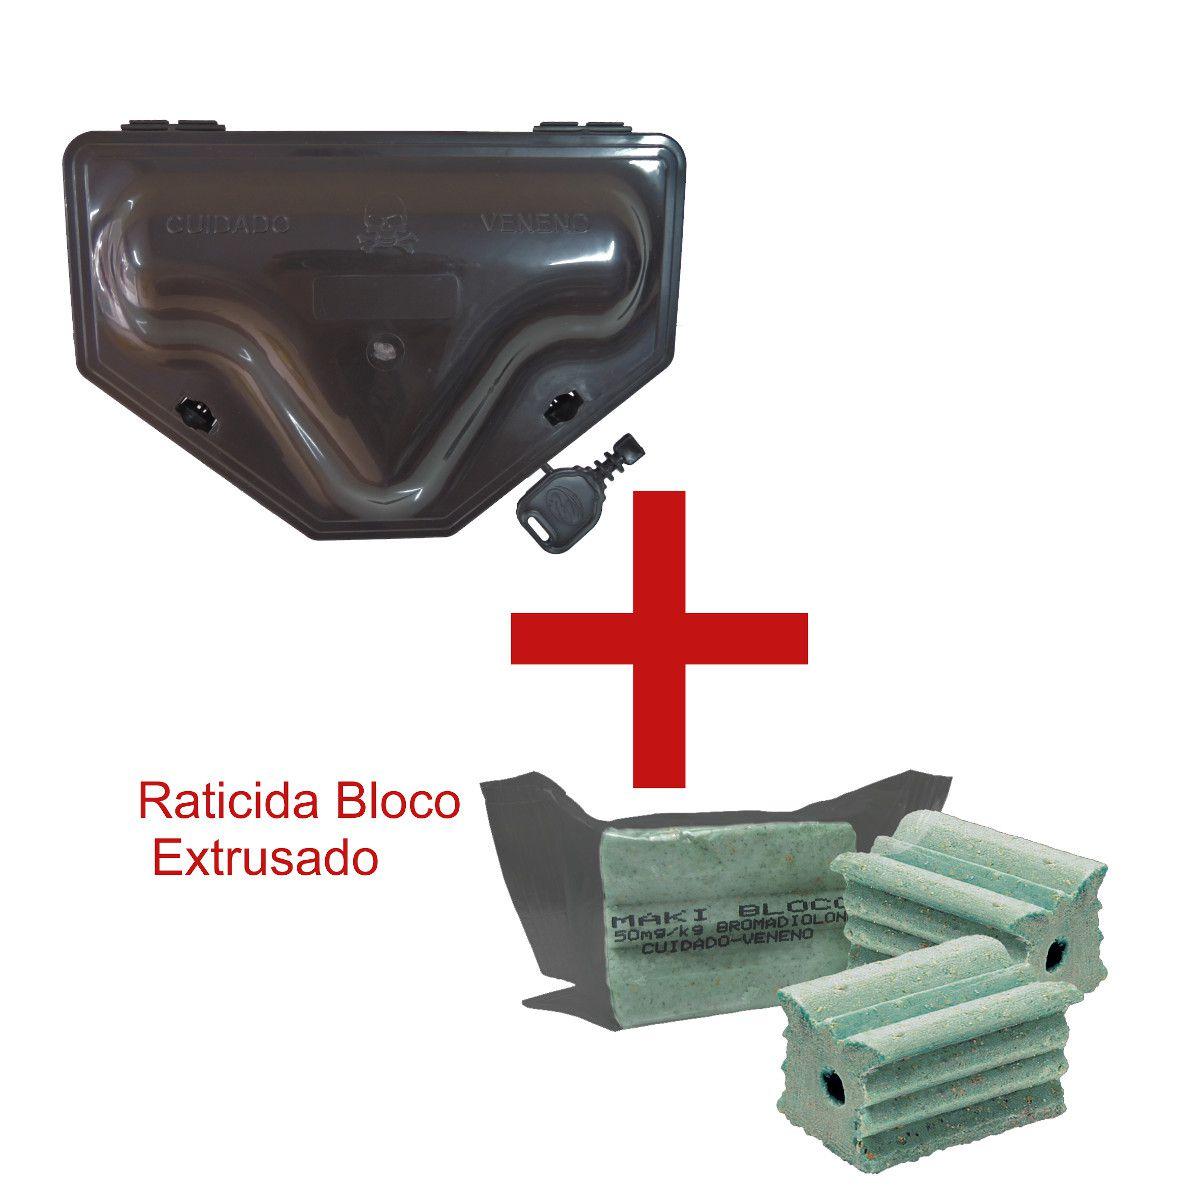 KIT 25 Armadilha p/Ratos Porta Iscas 2 TRAVAS Chave Ratoeira